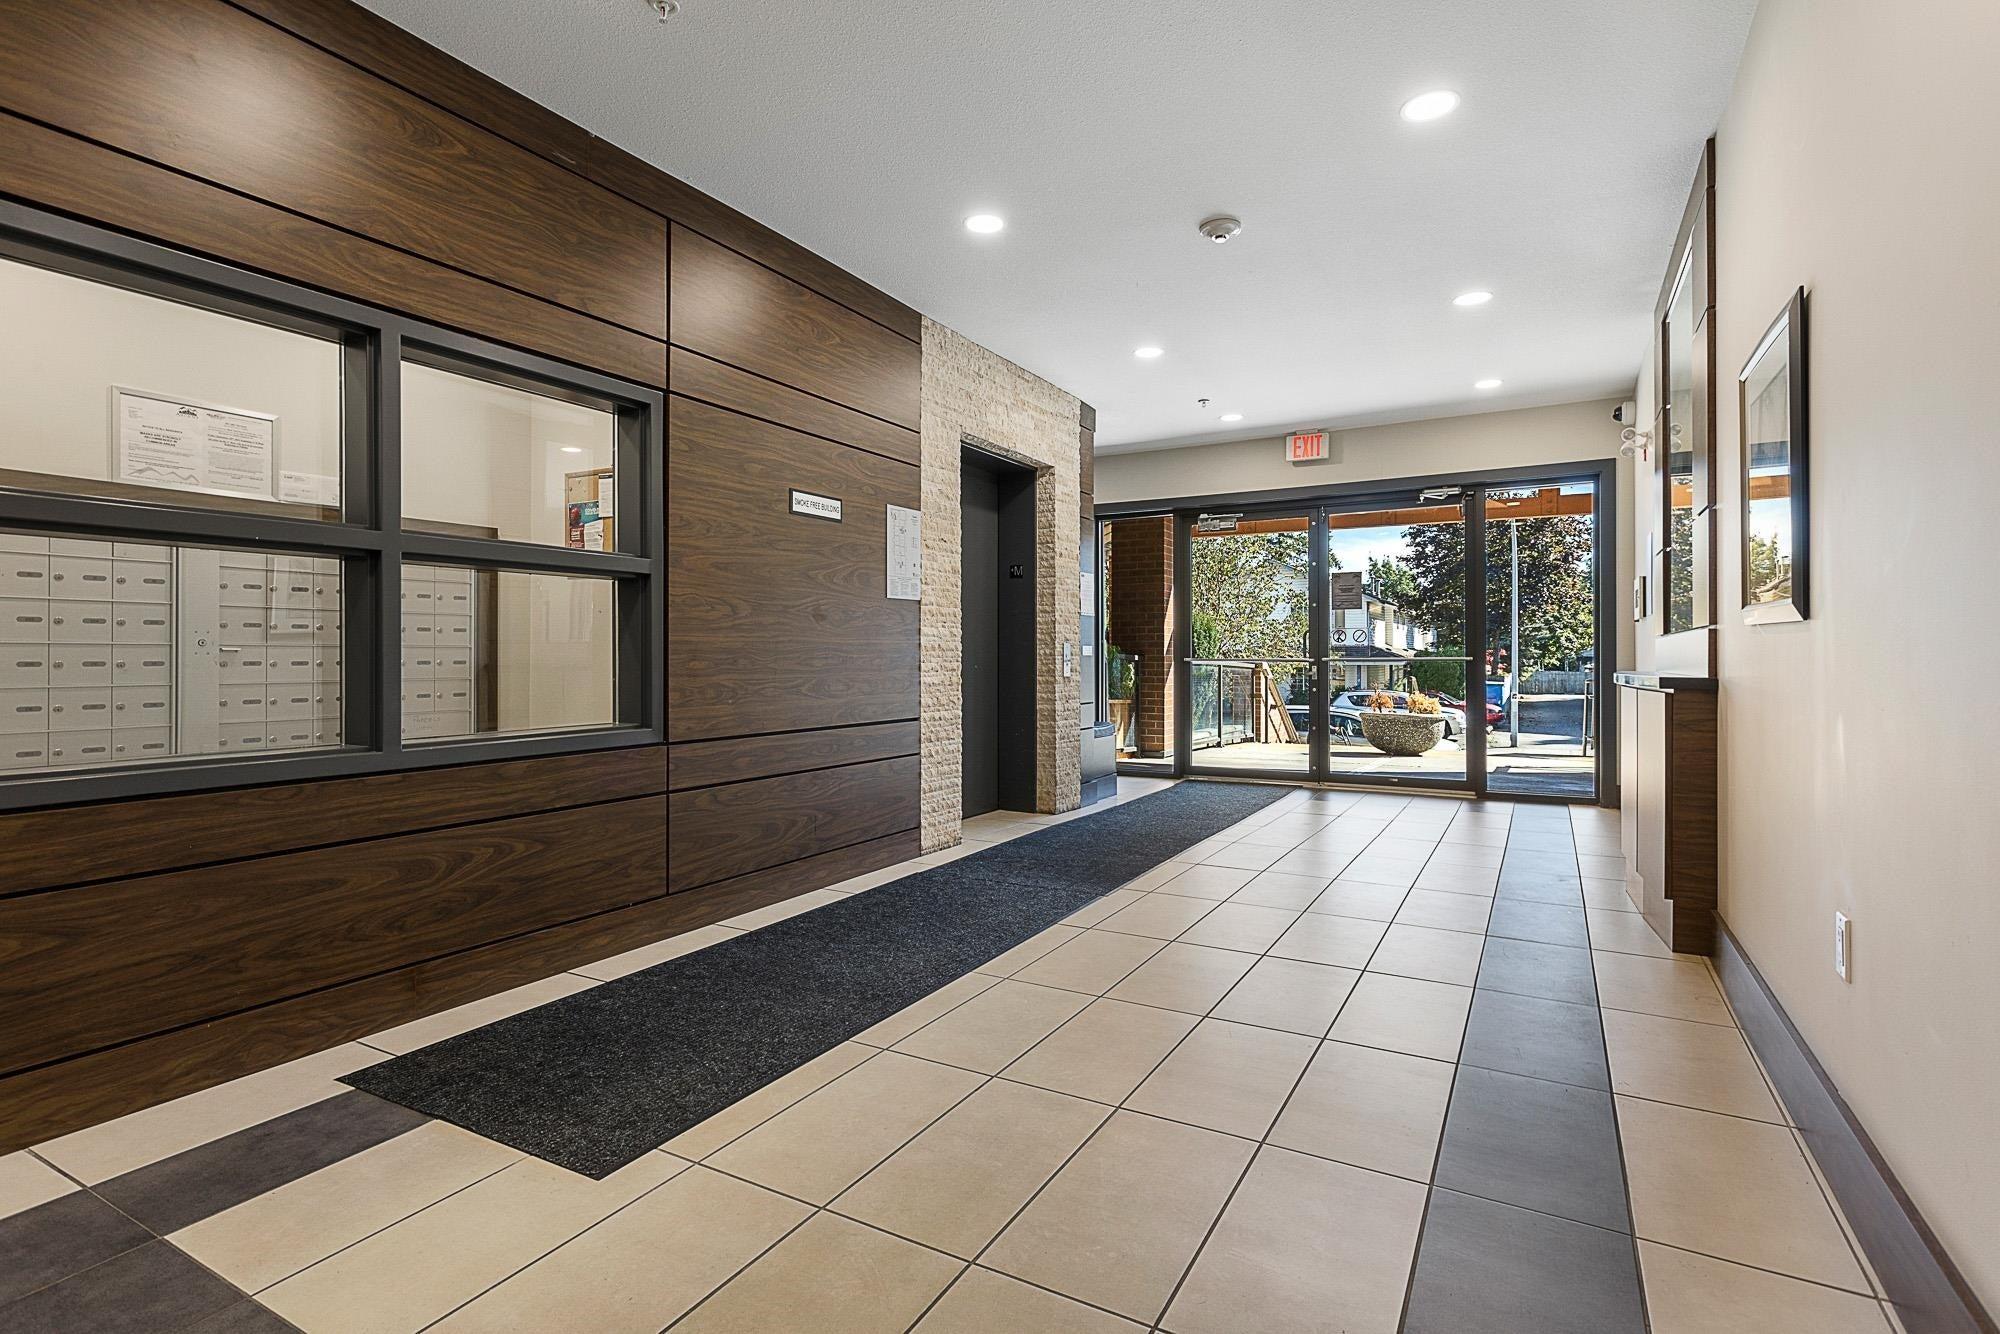 114 20219 54A AVENUE - Langley City Apartment/Condo for sale, 1 Bedroom (R2616172) - #24